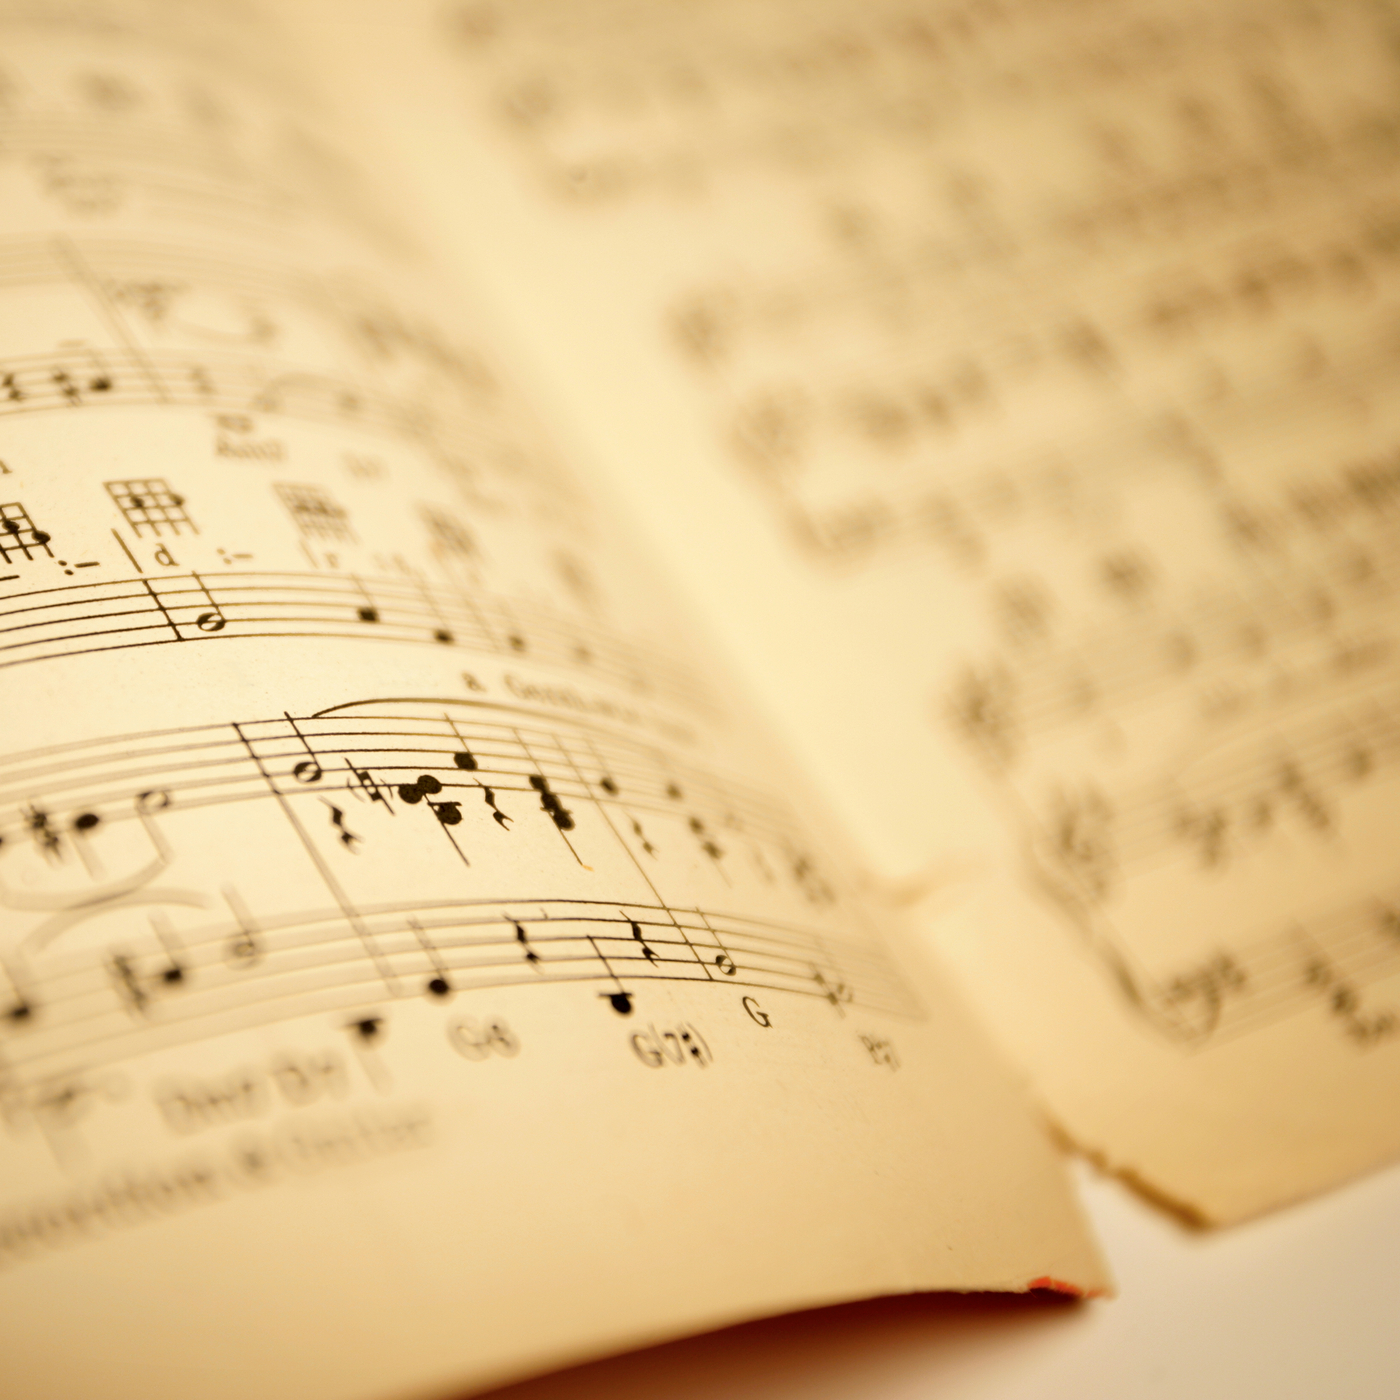 Mostly Classical On RadioTunes - RadioTunes